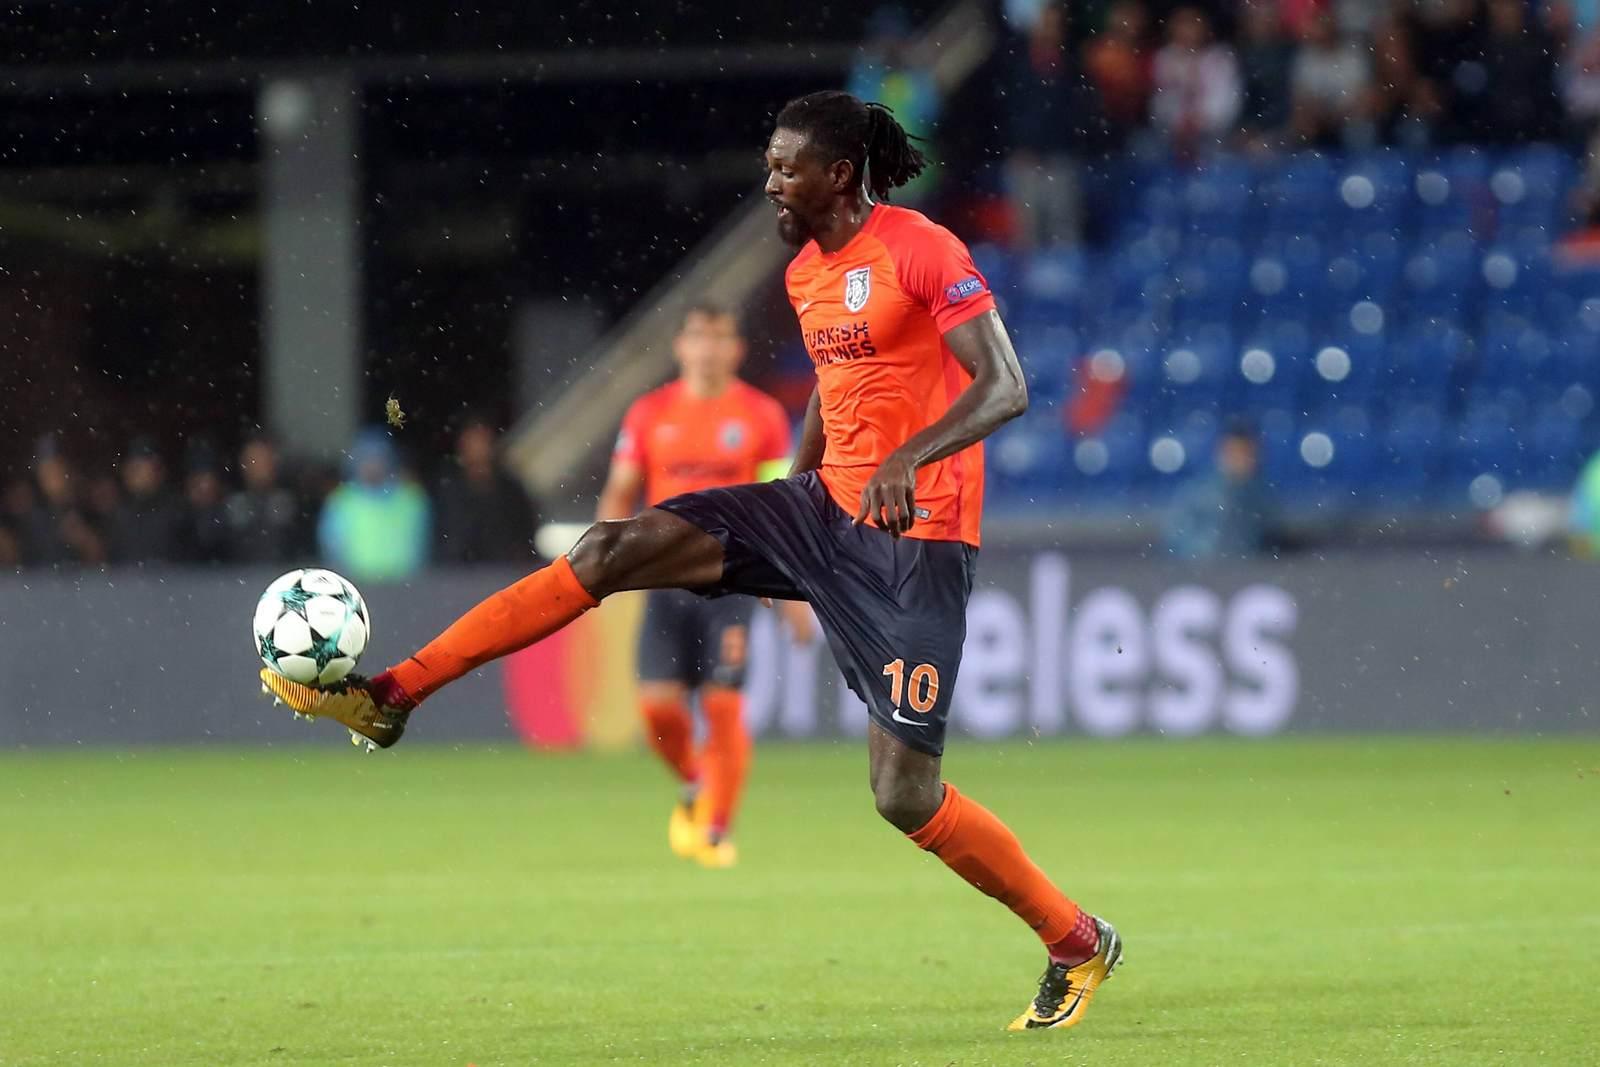 Emmanuel Adebayer führt den Ball. Wer gewinnt das Duell Basaksehir gegen Rasgrad. Jetzt wetten